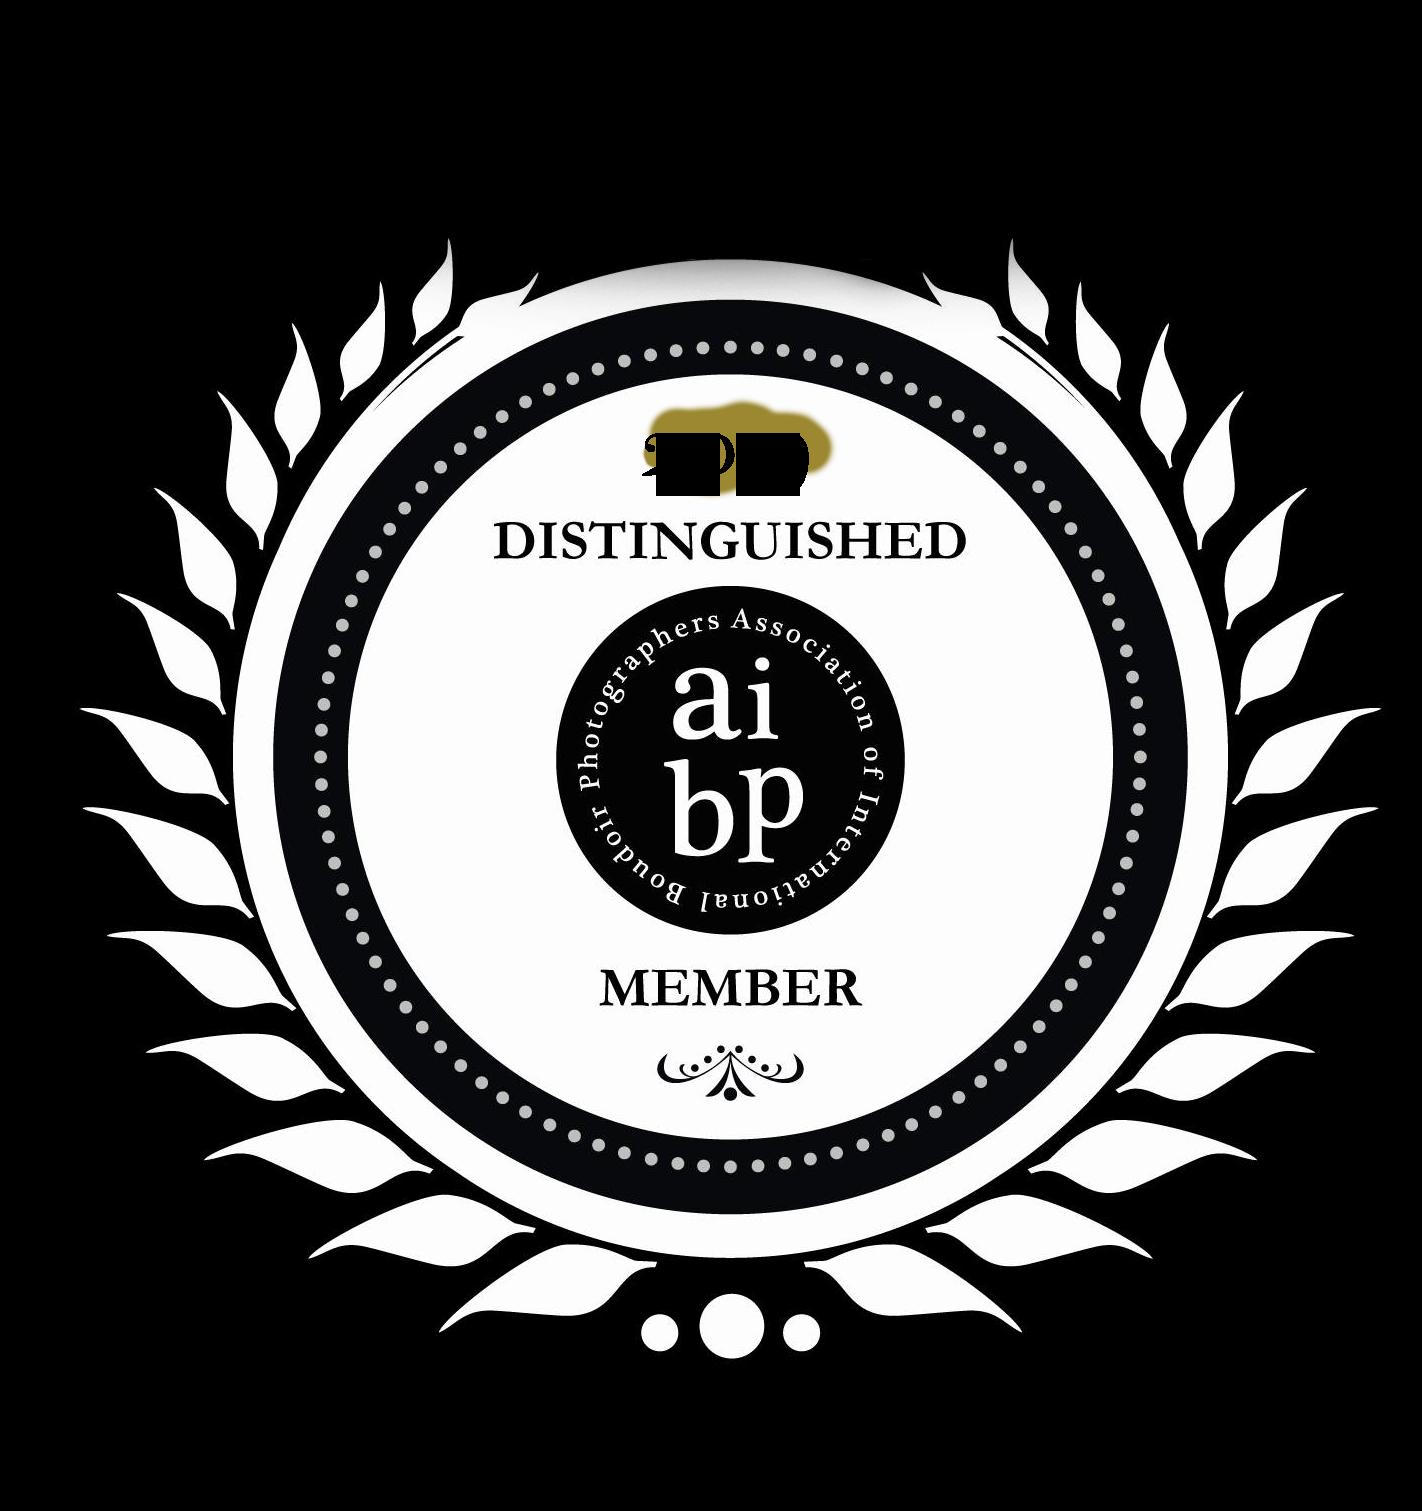 2019_Member_Badge_AIBPTransparent.png